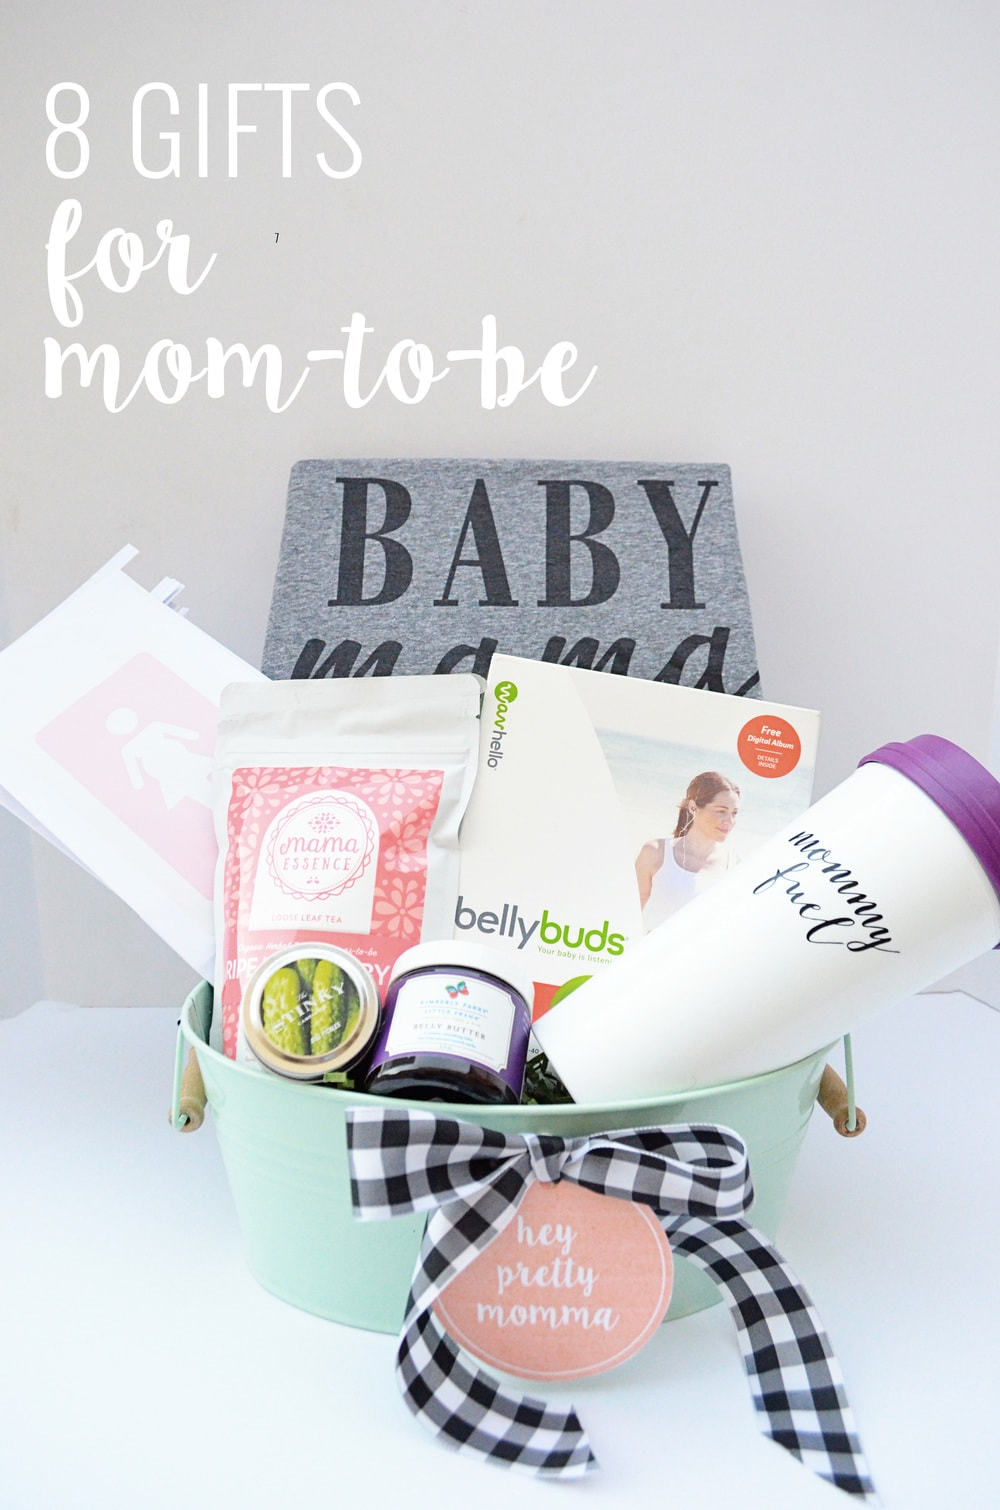 8+Gift+Ideas+for+Pregnant+Mommas+_+Momma+Society-The+Community+of+Modern+Moms+_+www.MommaSociety-min.jpg